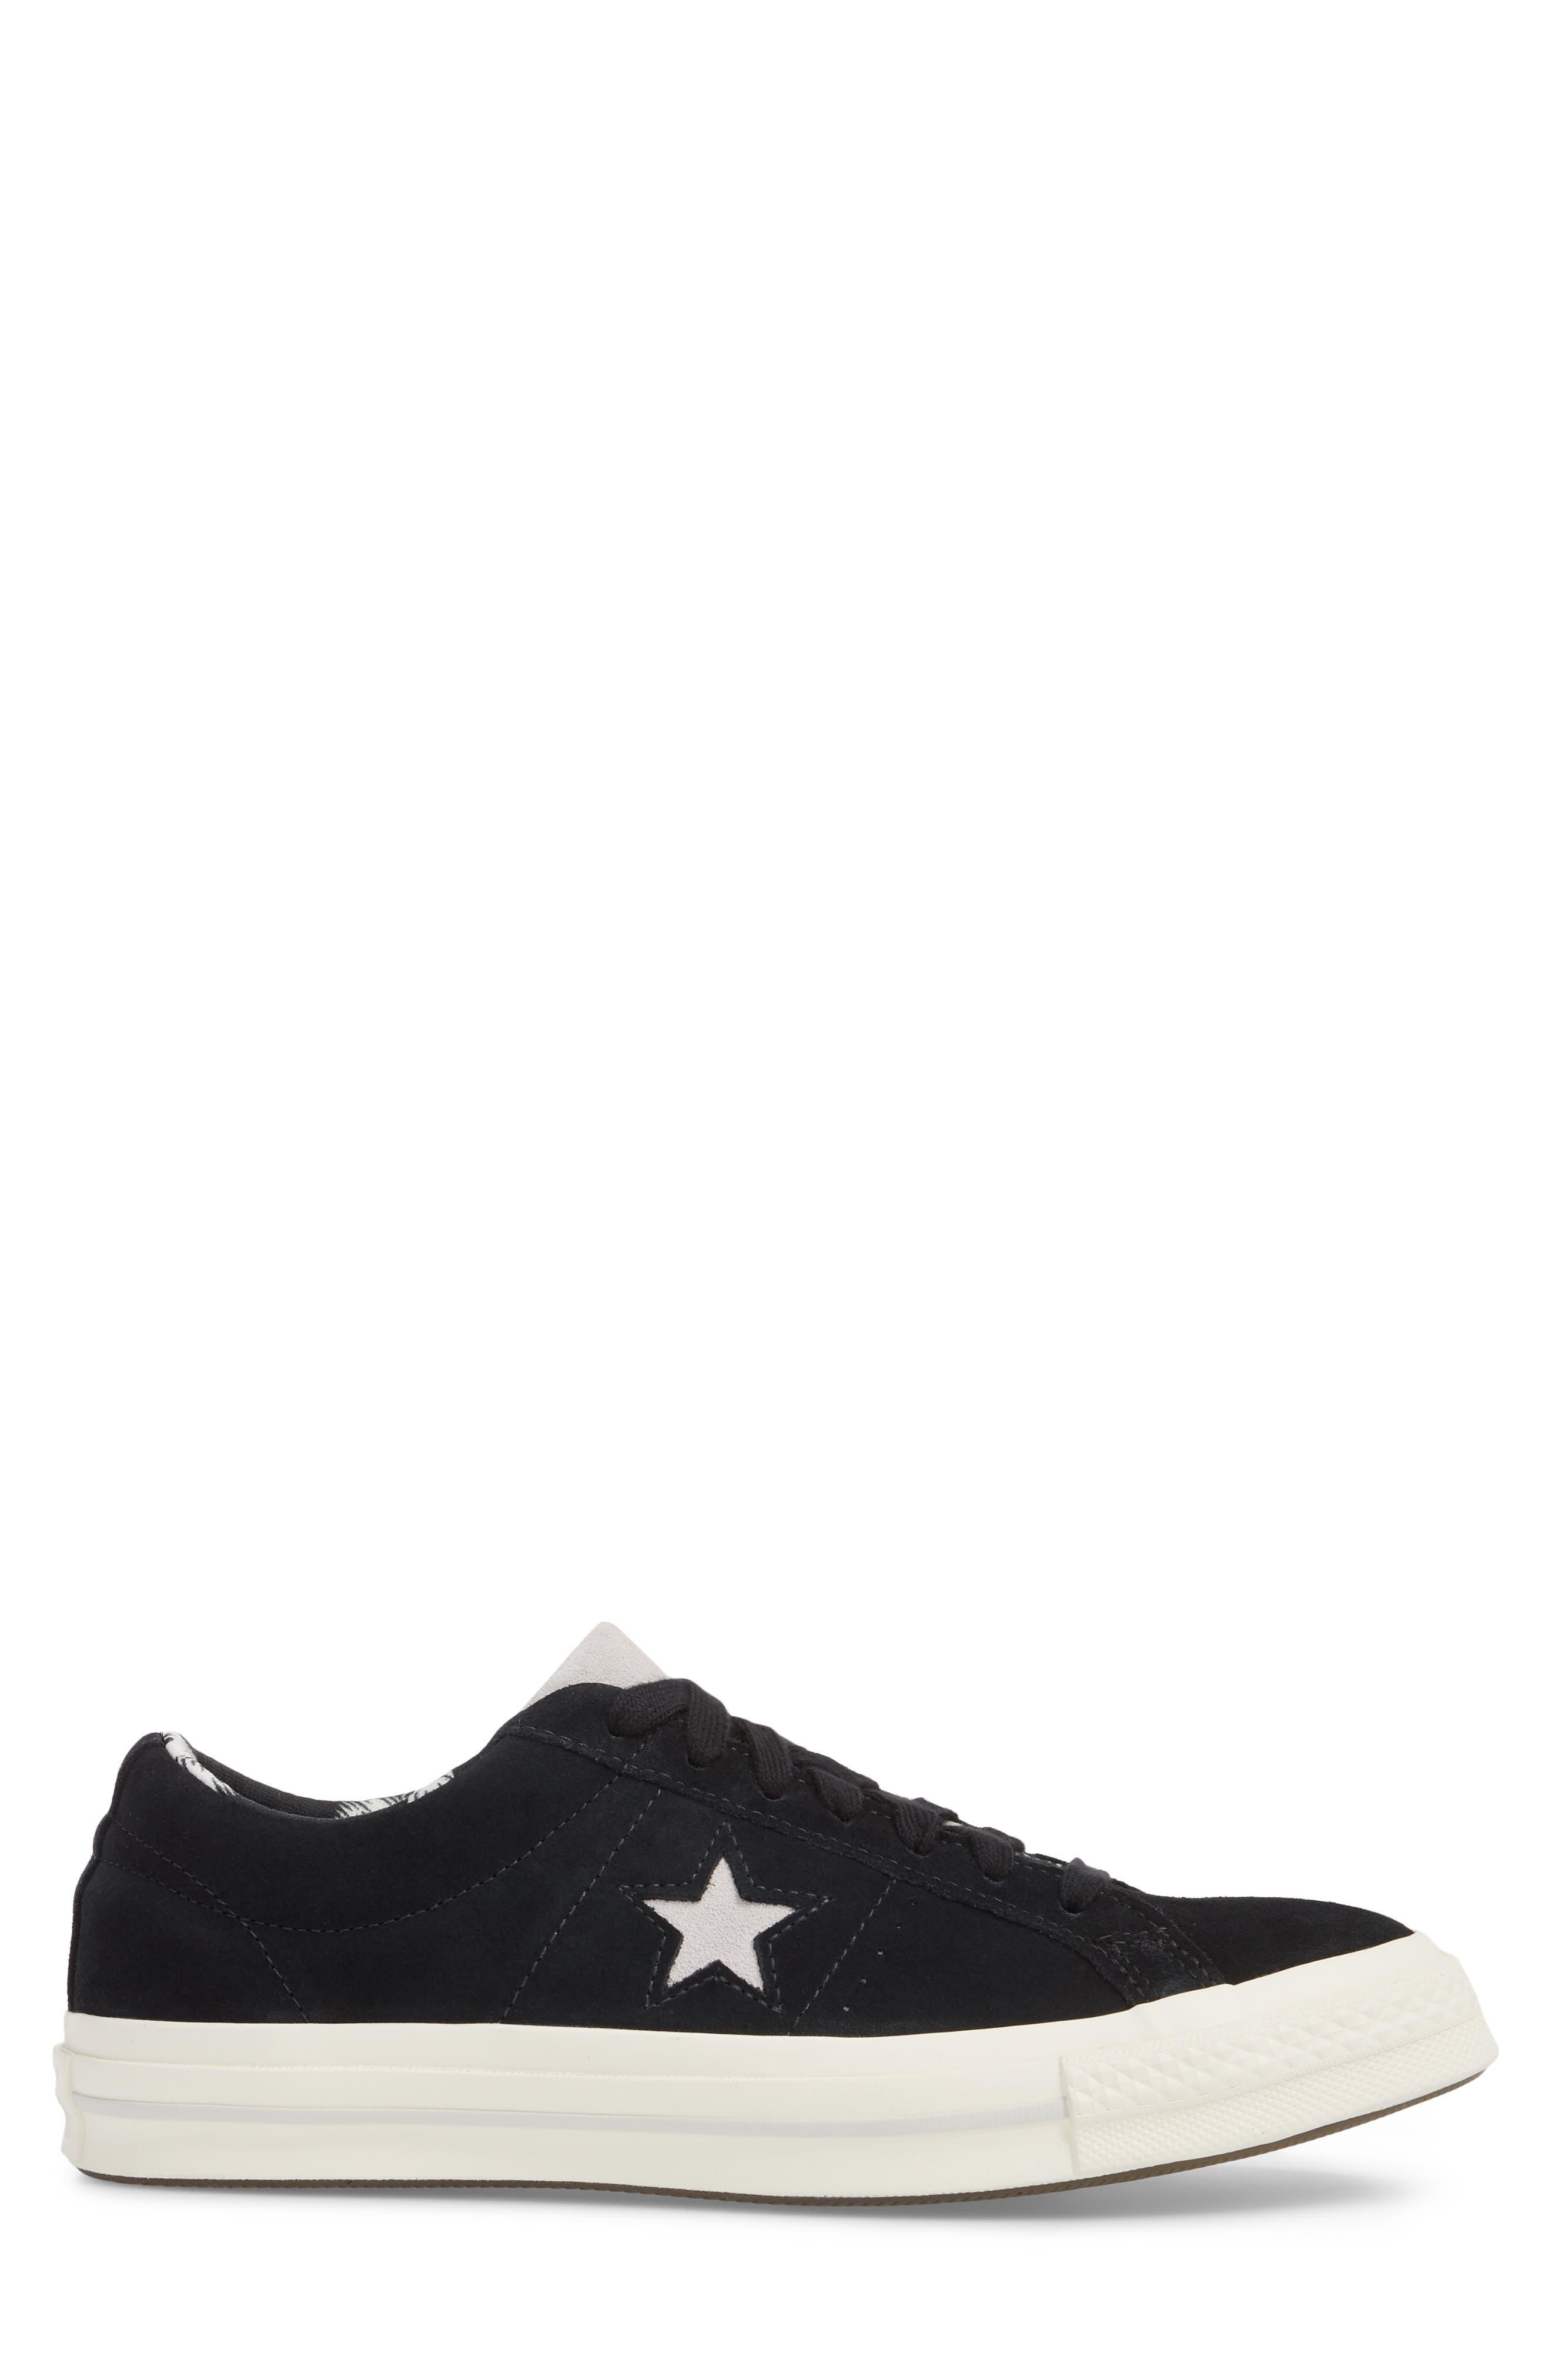 One-Star Tropical Sneaker,                             Alternate thumbnail 3, color,                             001